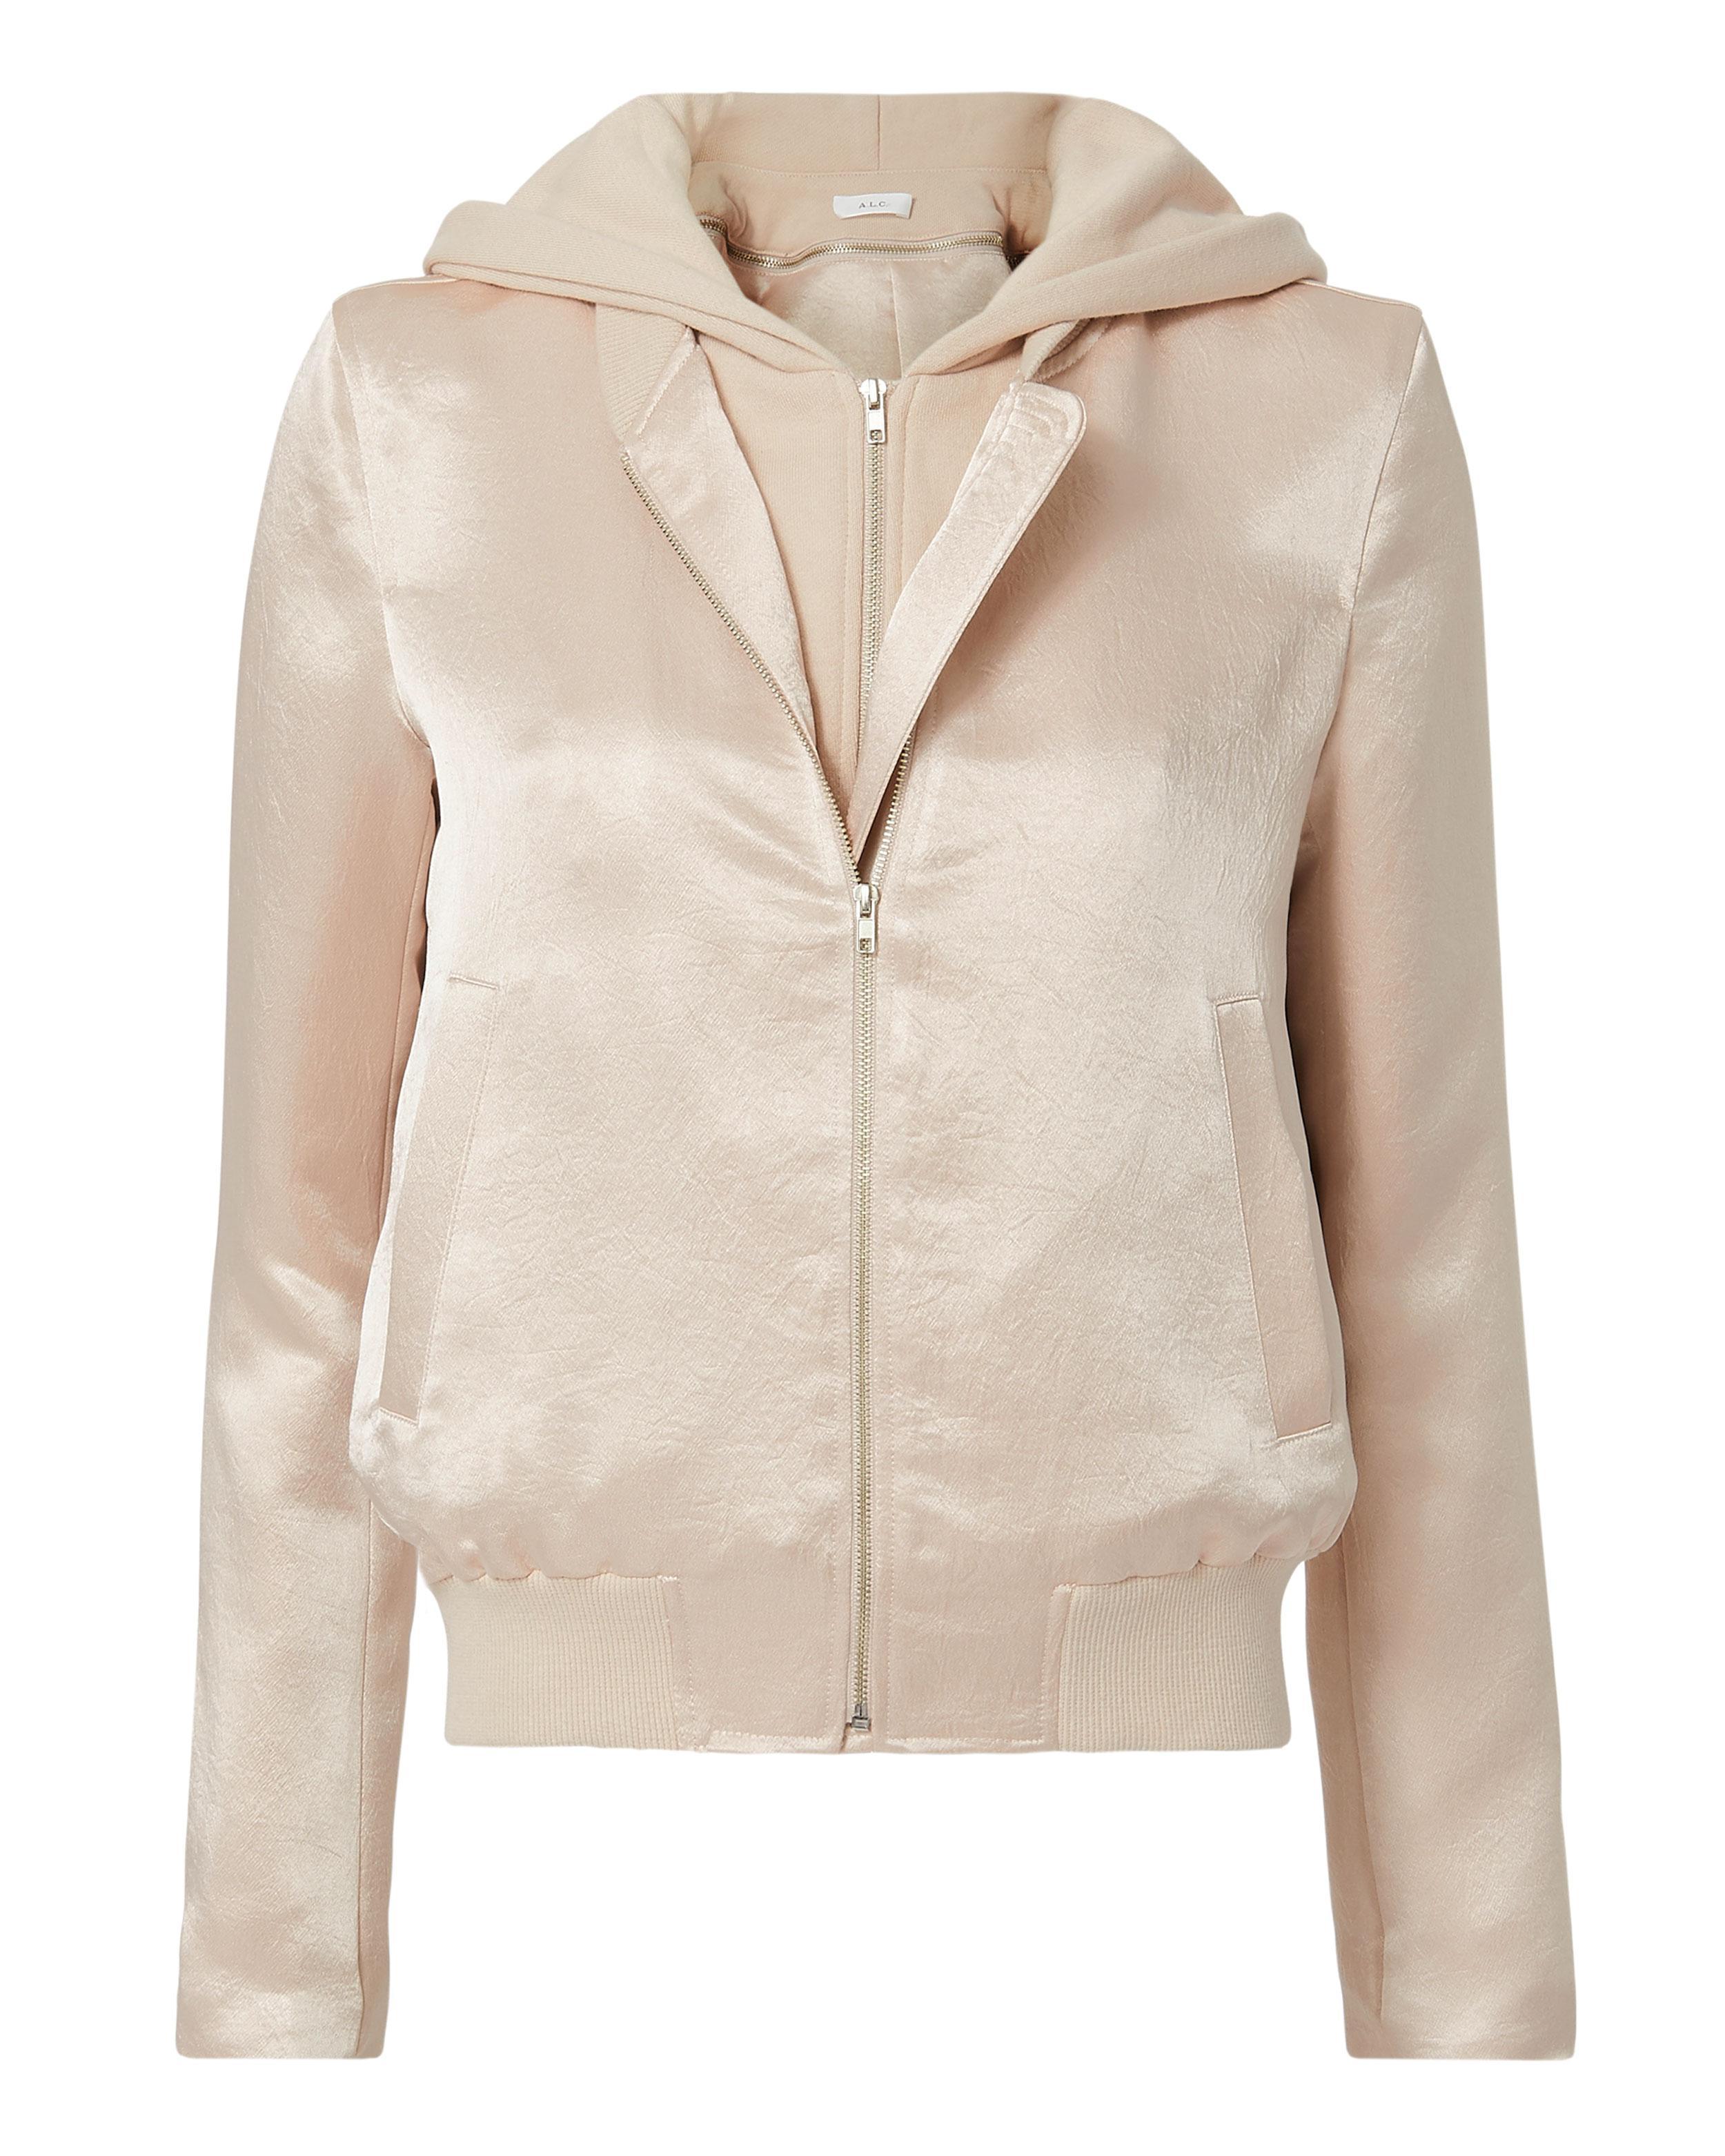 Theo Satin Hooded Jacket A.L.C. Popular Sale Online JZCkW